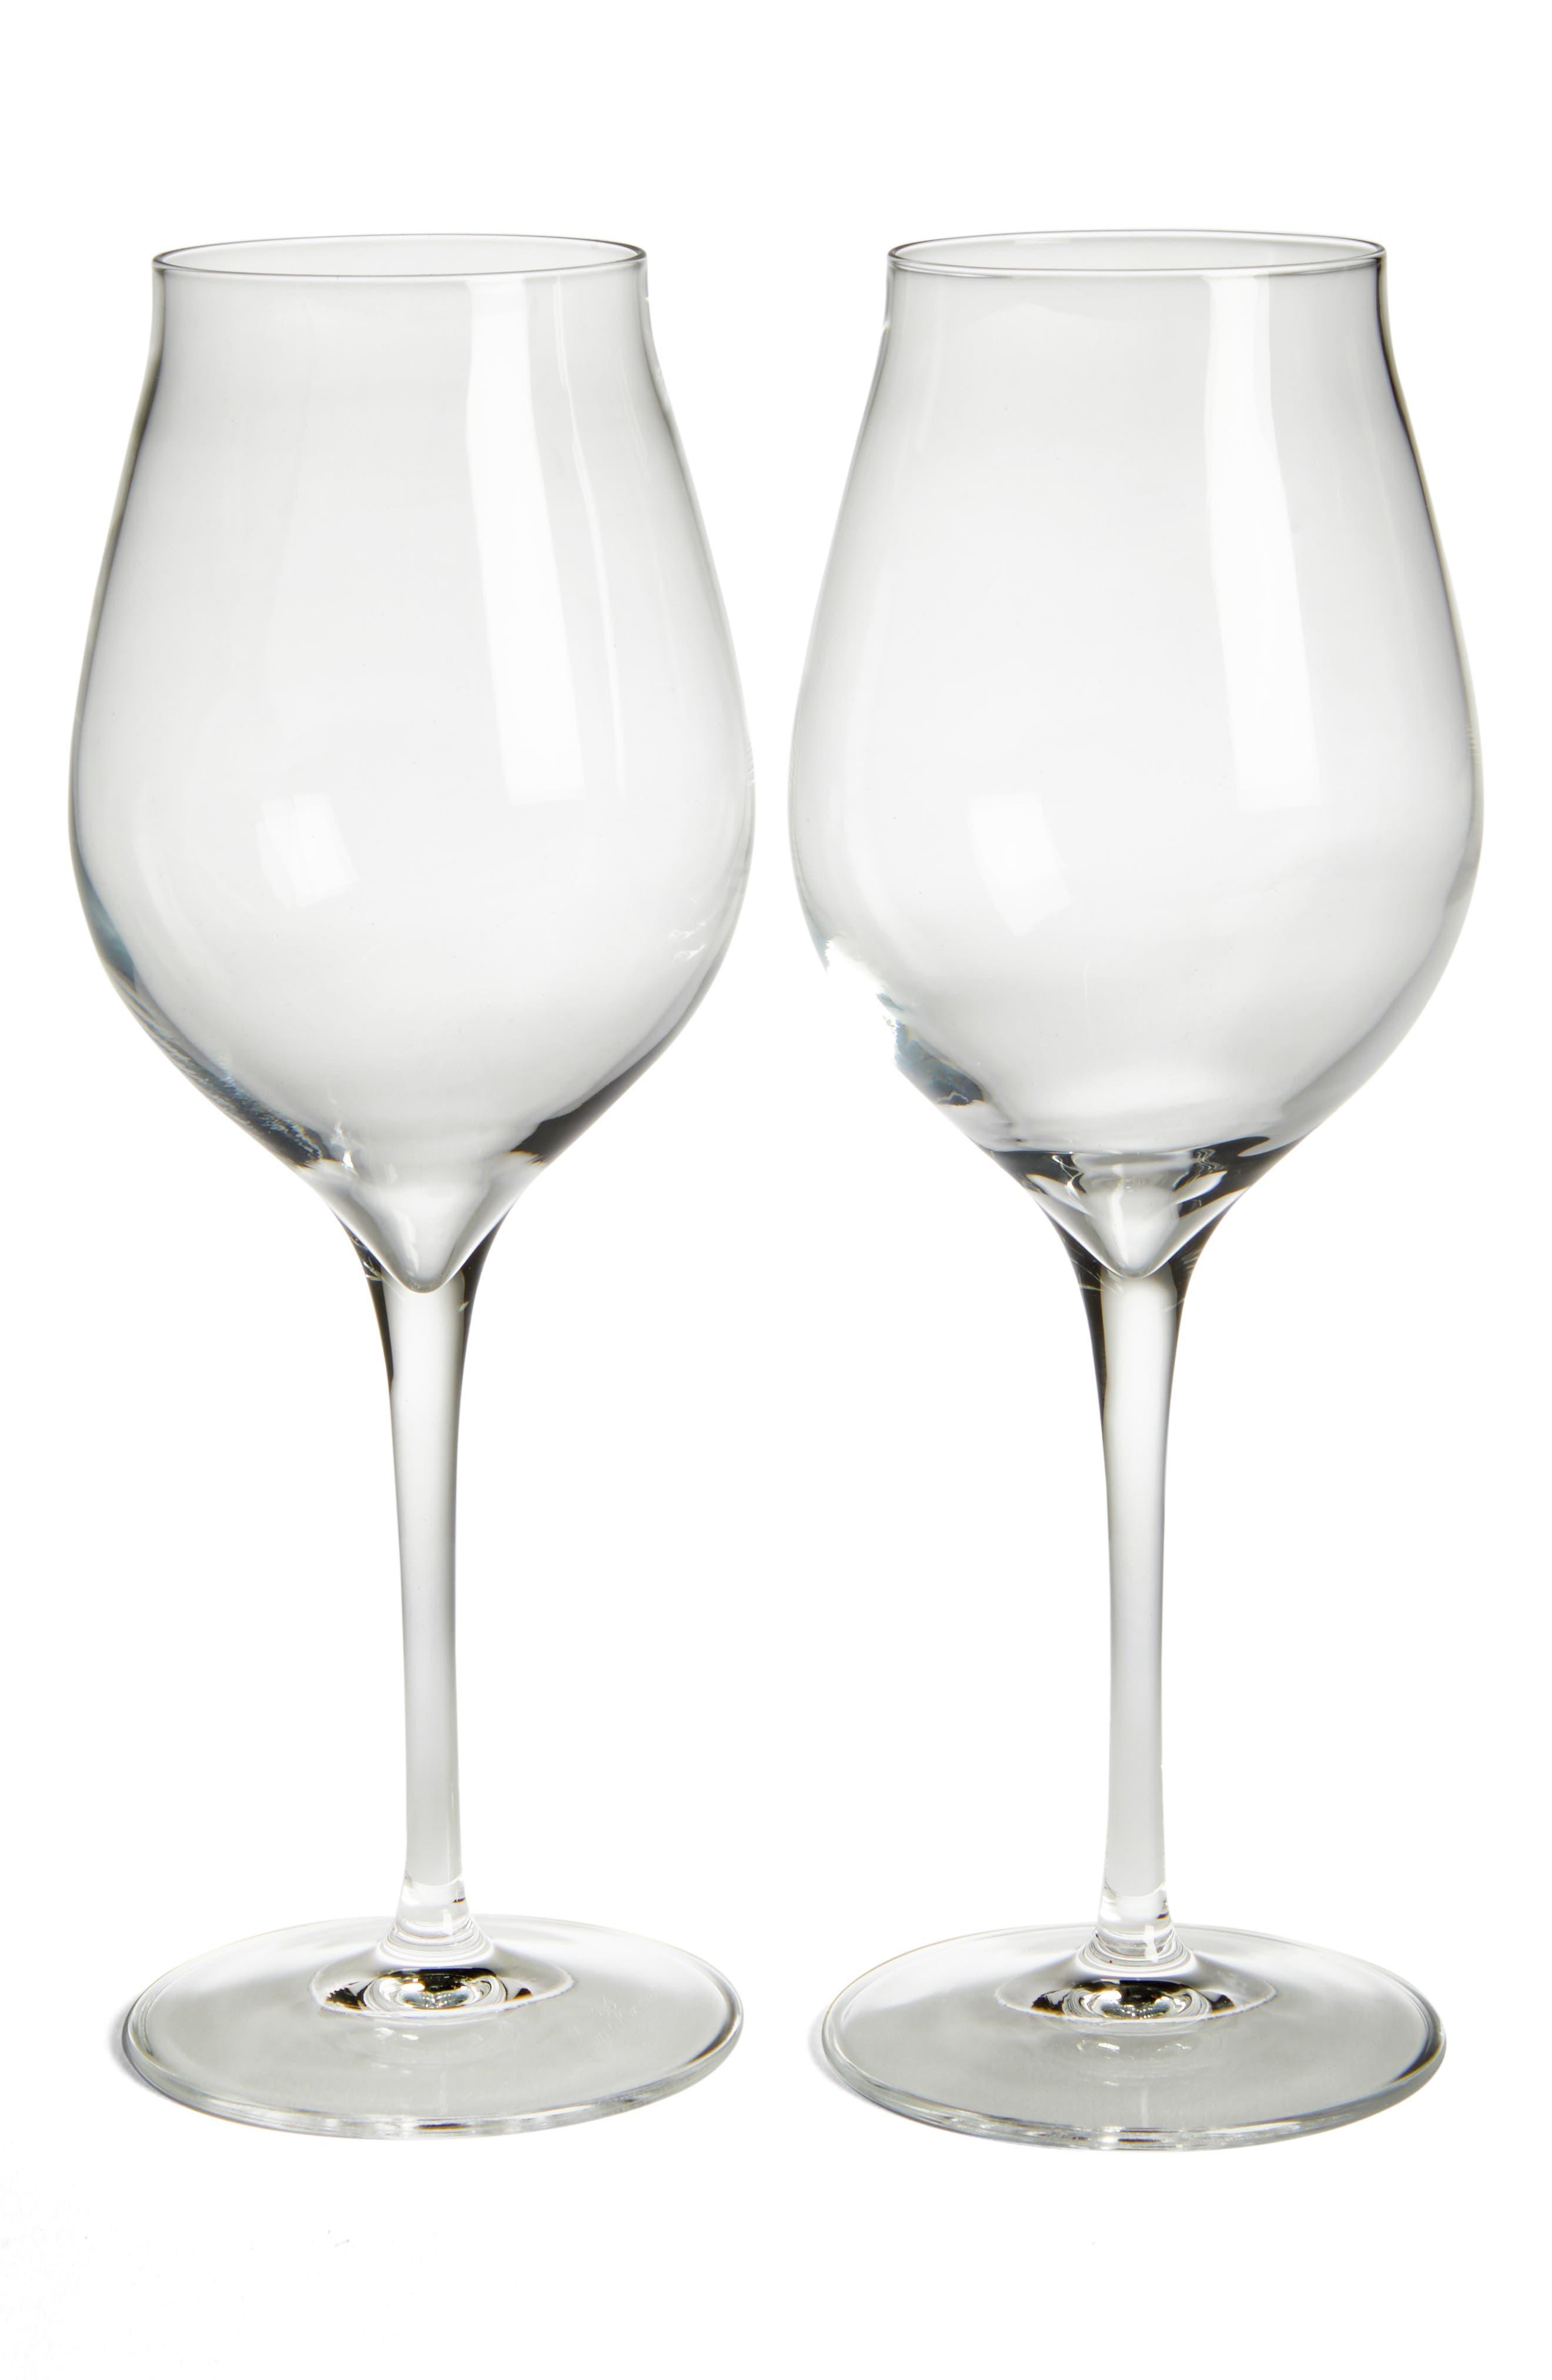 Luigi Bormiolo Vinea Malvasia/Orvieto Set of 2 White Wine Glasses,                             Main thumbnail 1, color,                             100